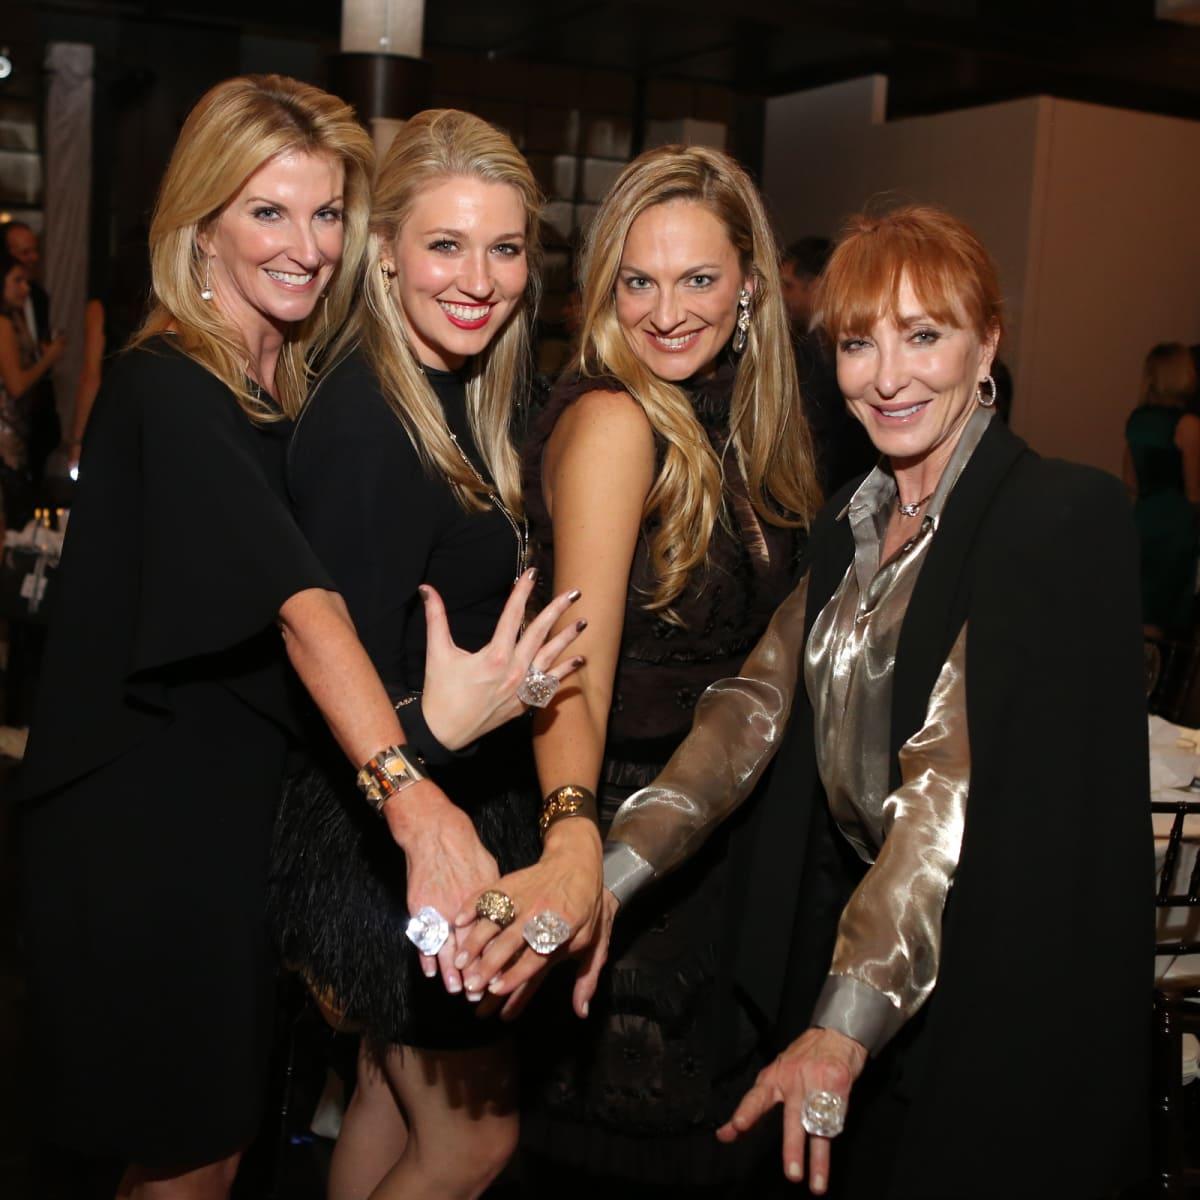 News, Shelby, Catwalk for a Cure, Nov. 2015, Kim Moody, Christina Stith, Rachel Ragen, Marty Finger